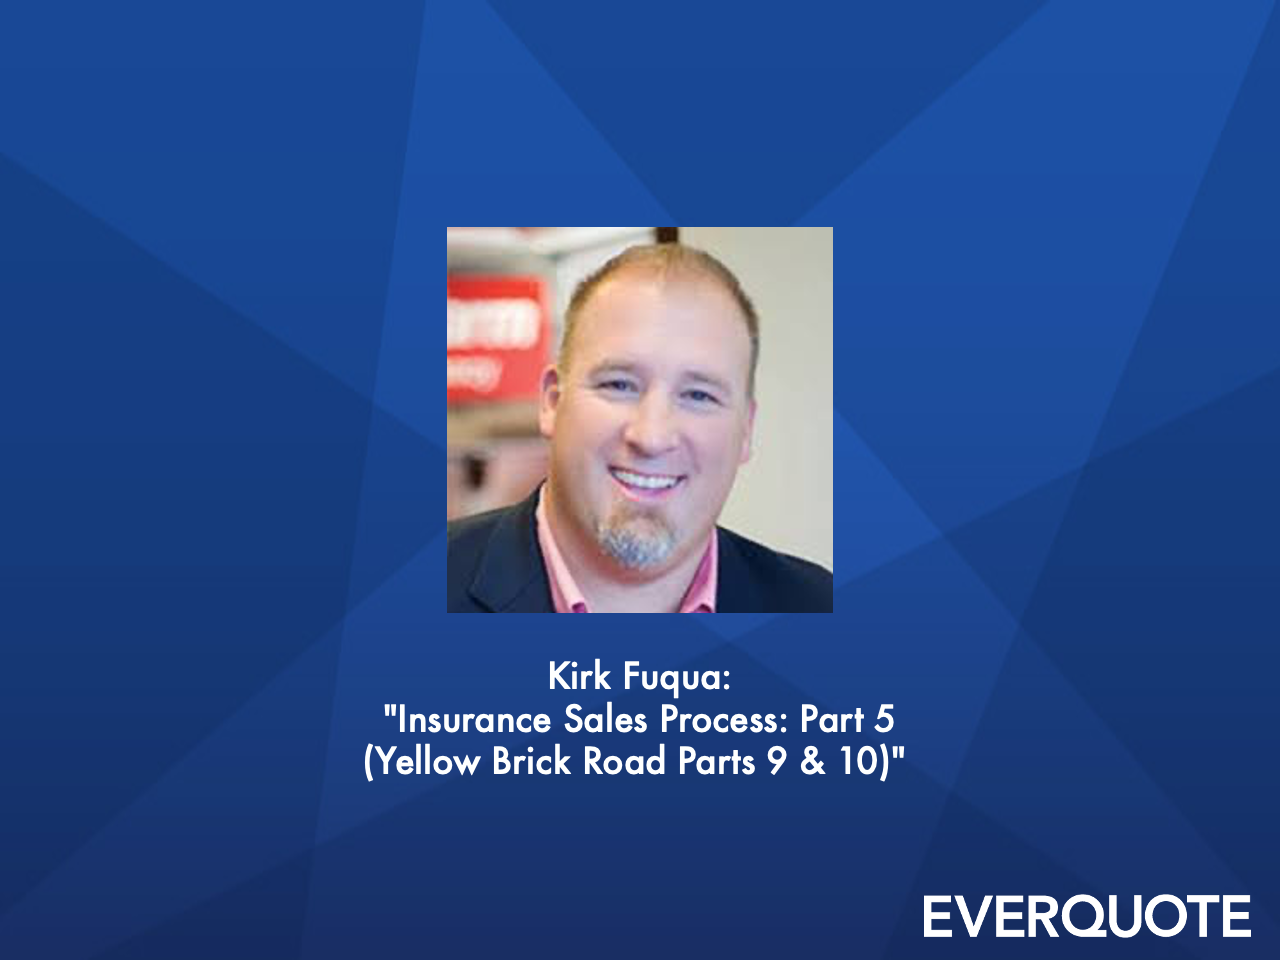 Insurance Sales Process: Part 5 (Yellow Brick Road Parts 9 & 10) with Kirk Fuqua